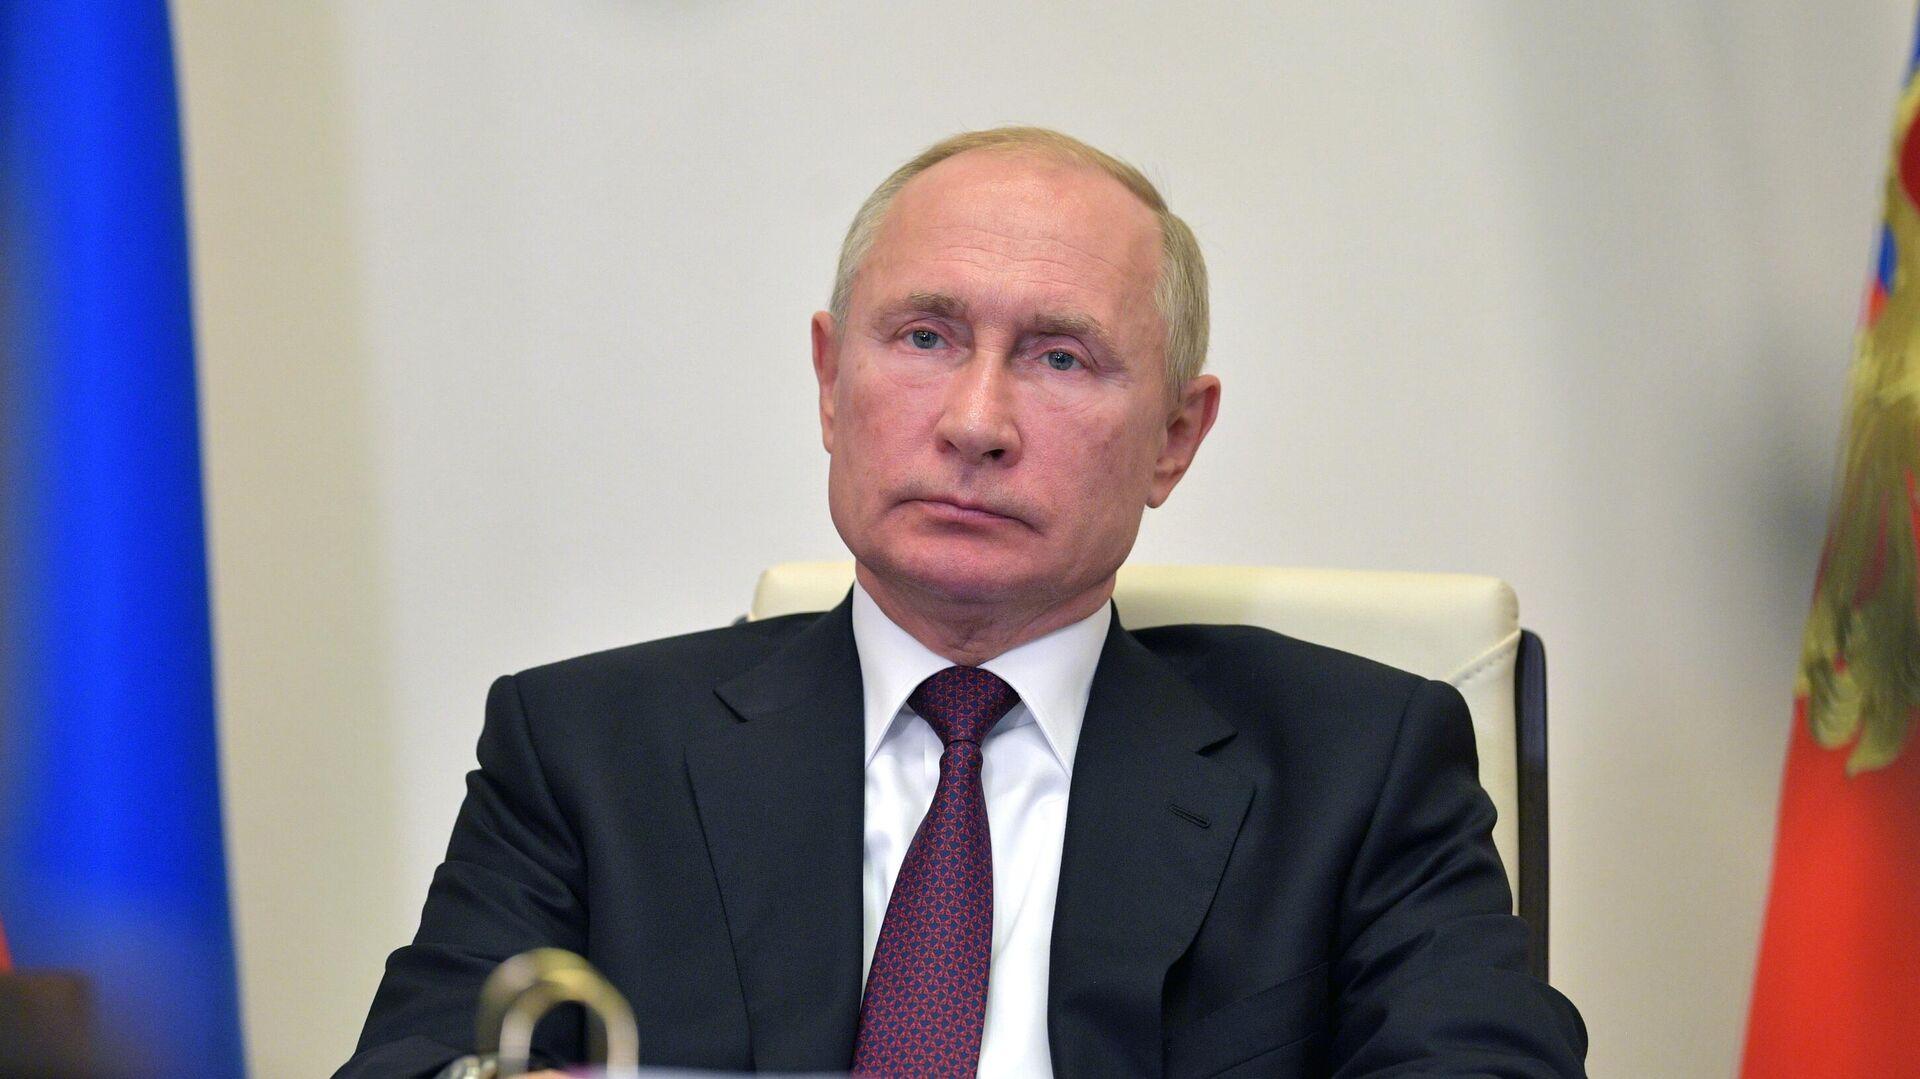 Президент РФ Владимир Путин во время видеоконференции - РИА Новости, 1920, 27.10.2020